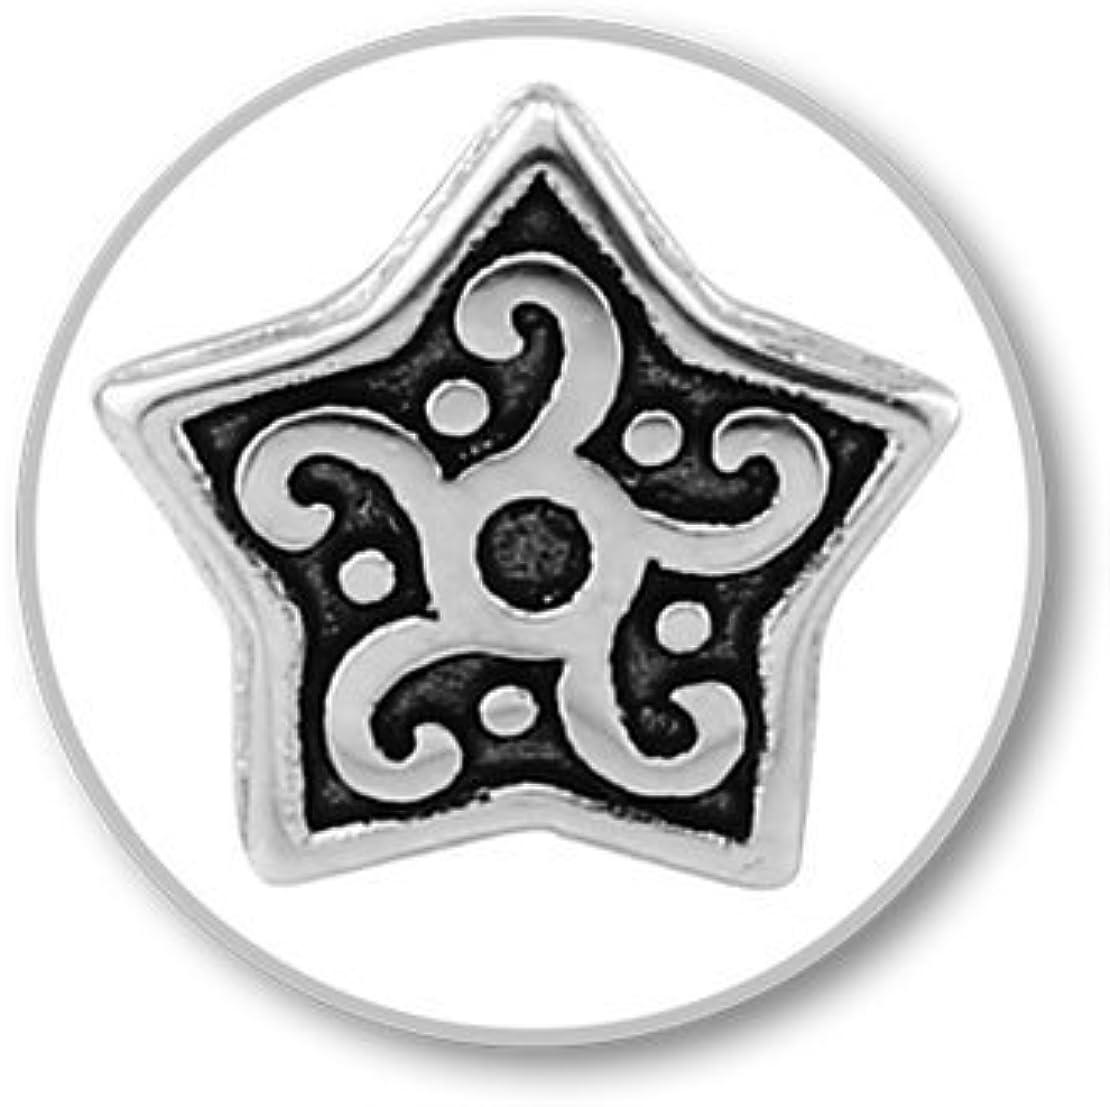 Star 16g El Morro Labret Body Piercing Jewelry Surgical Steel Internally Threaded Micro Labret